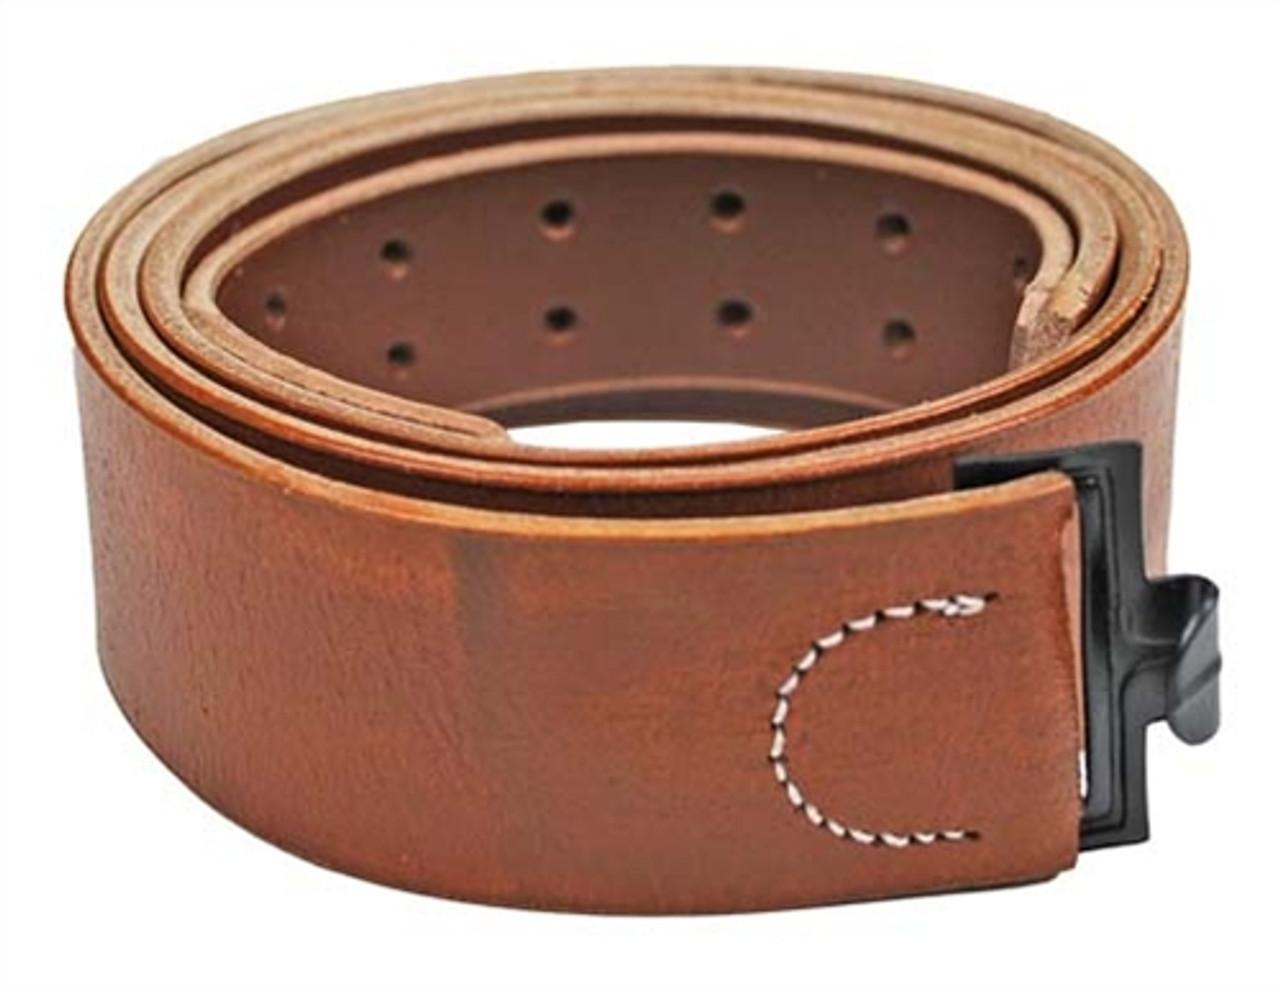 German Leather Equipment Belt from Hessen Antique